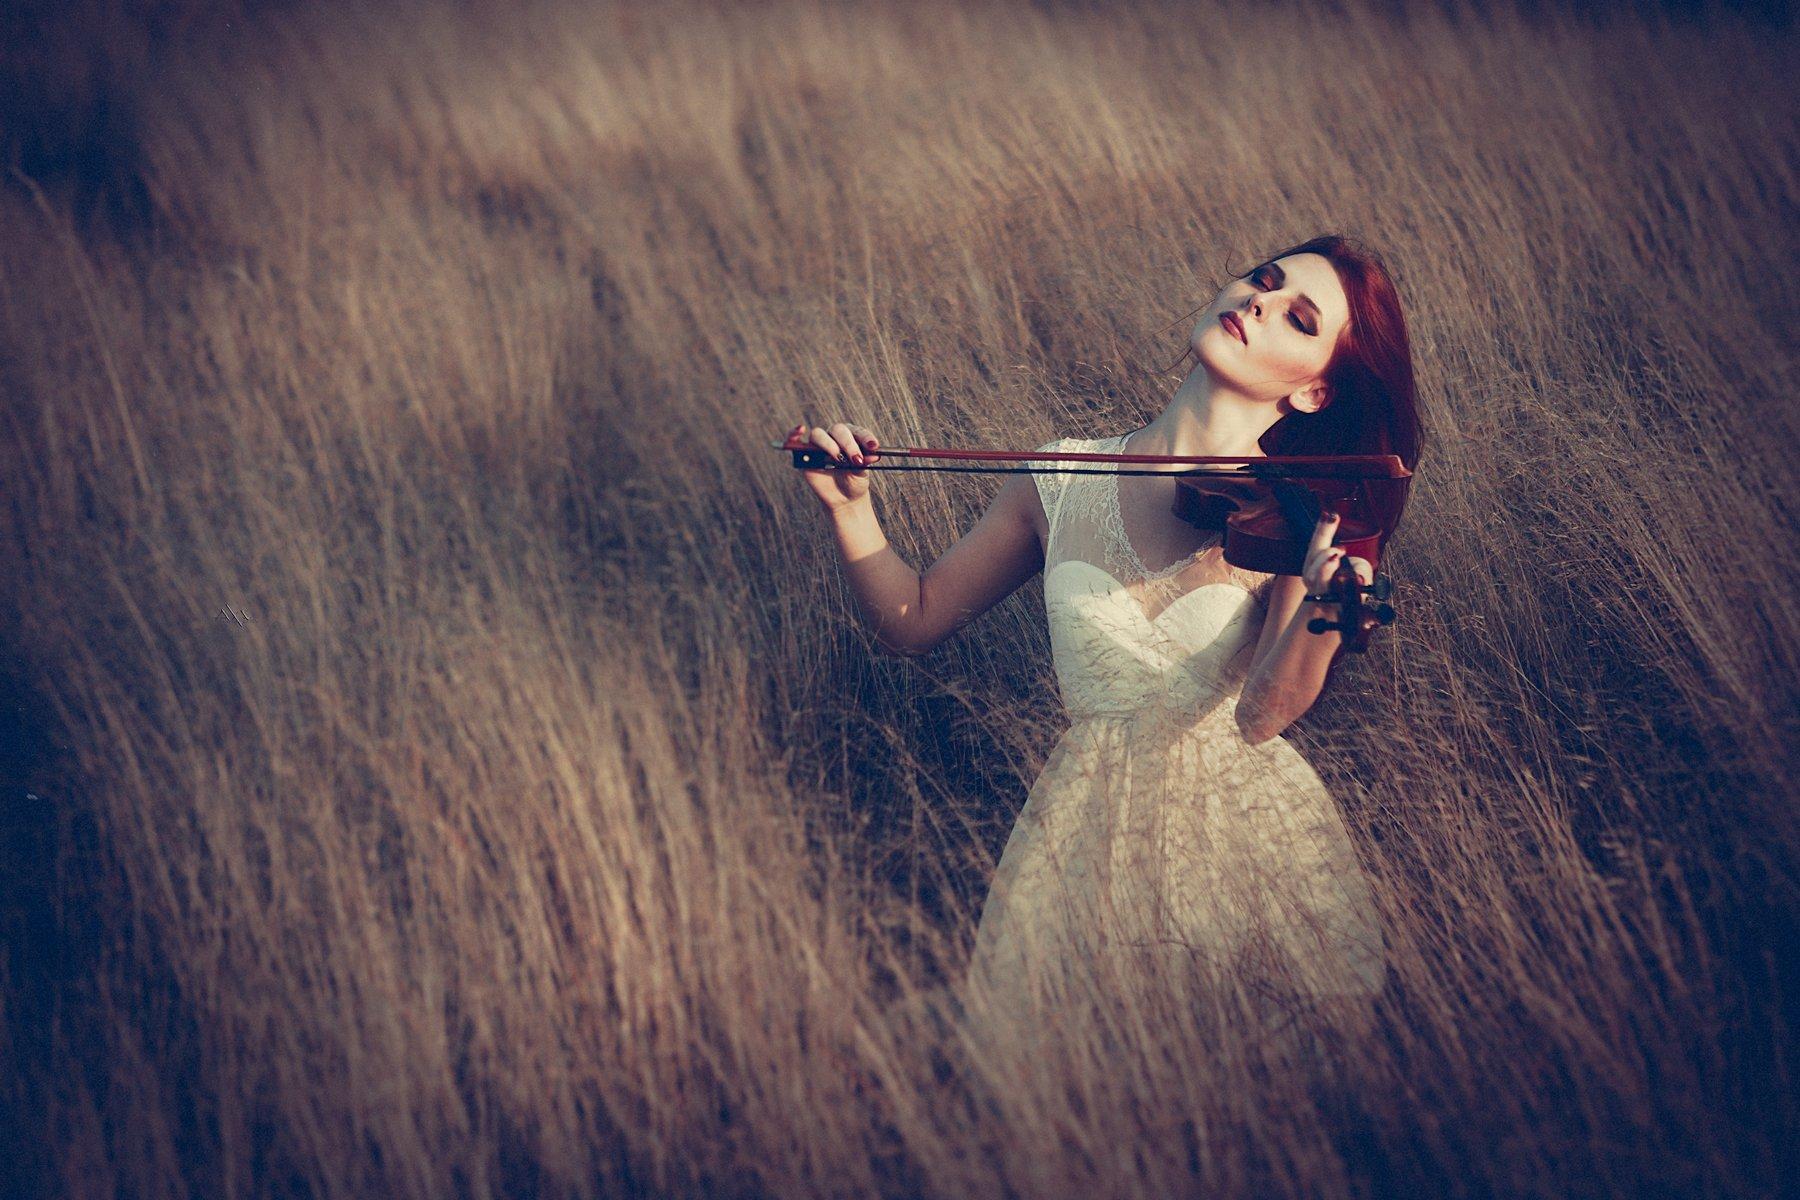 Autumn, Emotion, Mood, Music, Portrait, Violin, Wind, Woman, Руслан Болгов (Axe)